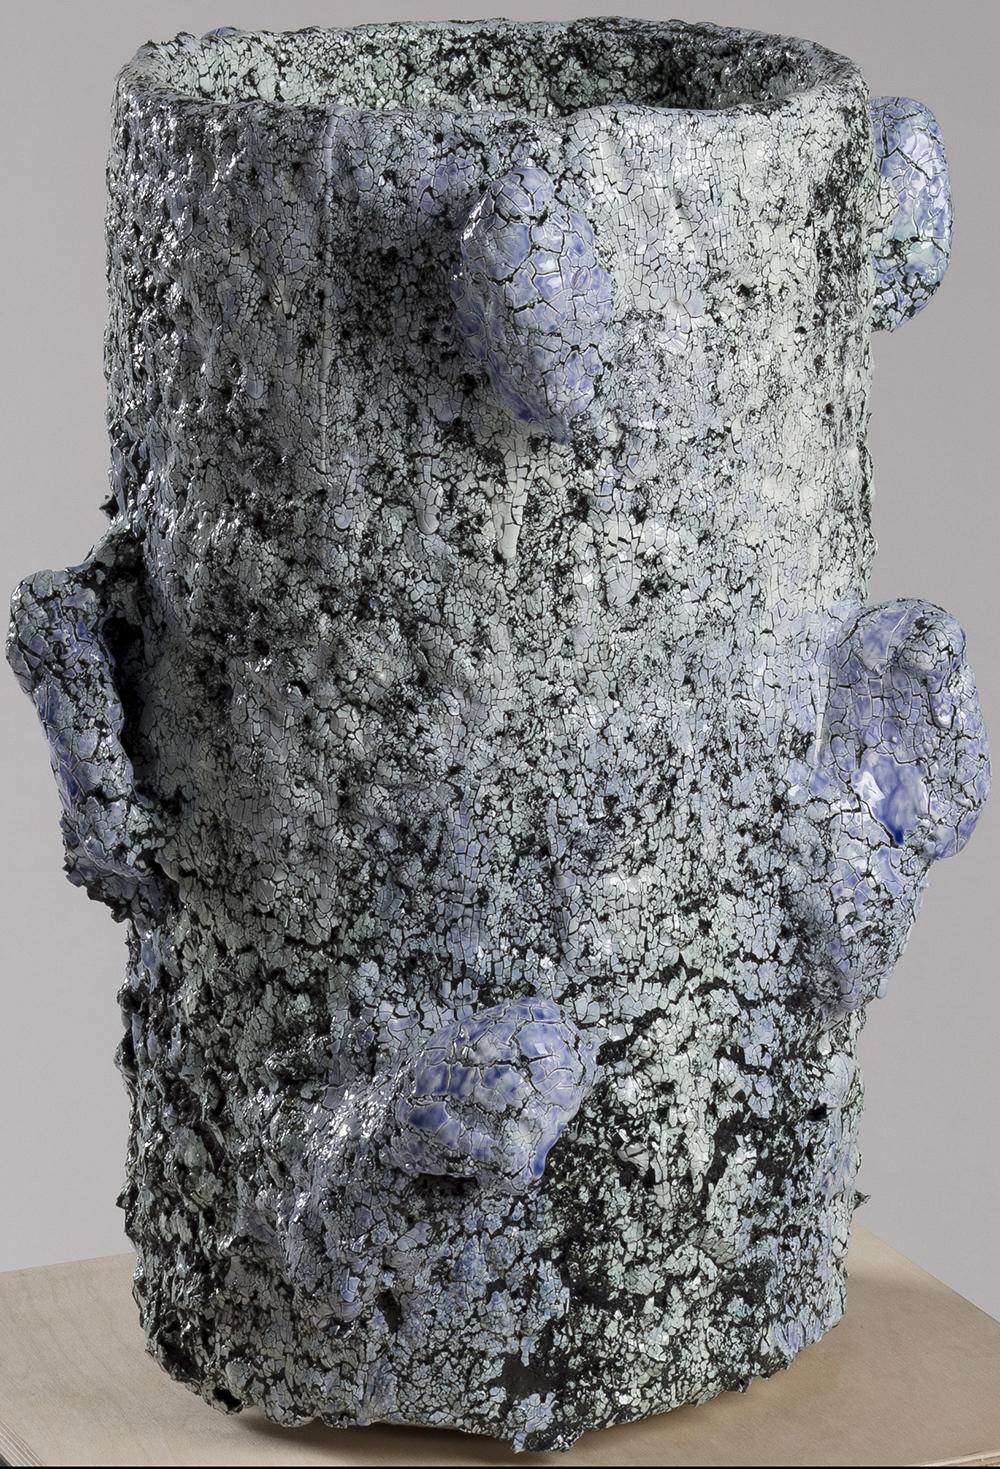 Tony Marsh. <em>Crucible Furiosa  2</em>, 2018. Ceramic, 19 x 16 x 16 inches (48.3 x 40.6 x 40.6 cm)